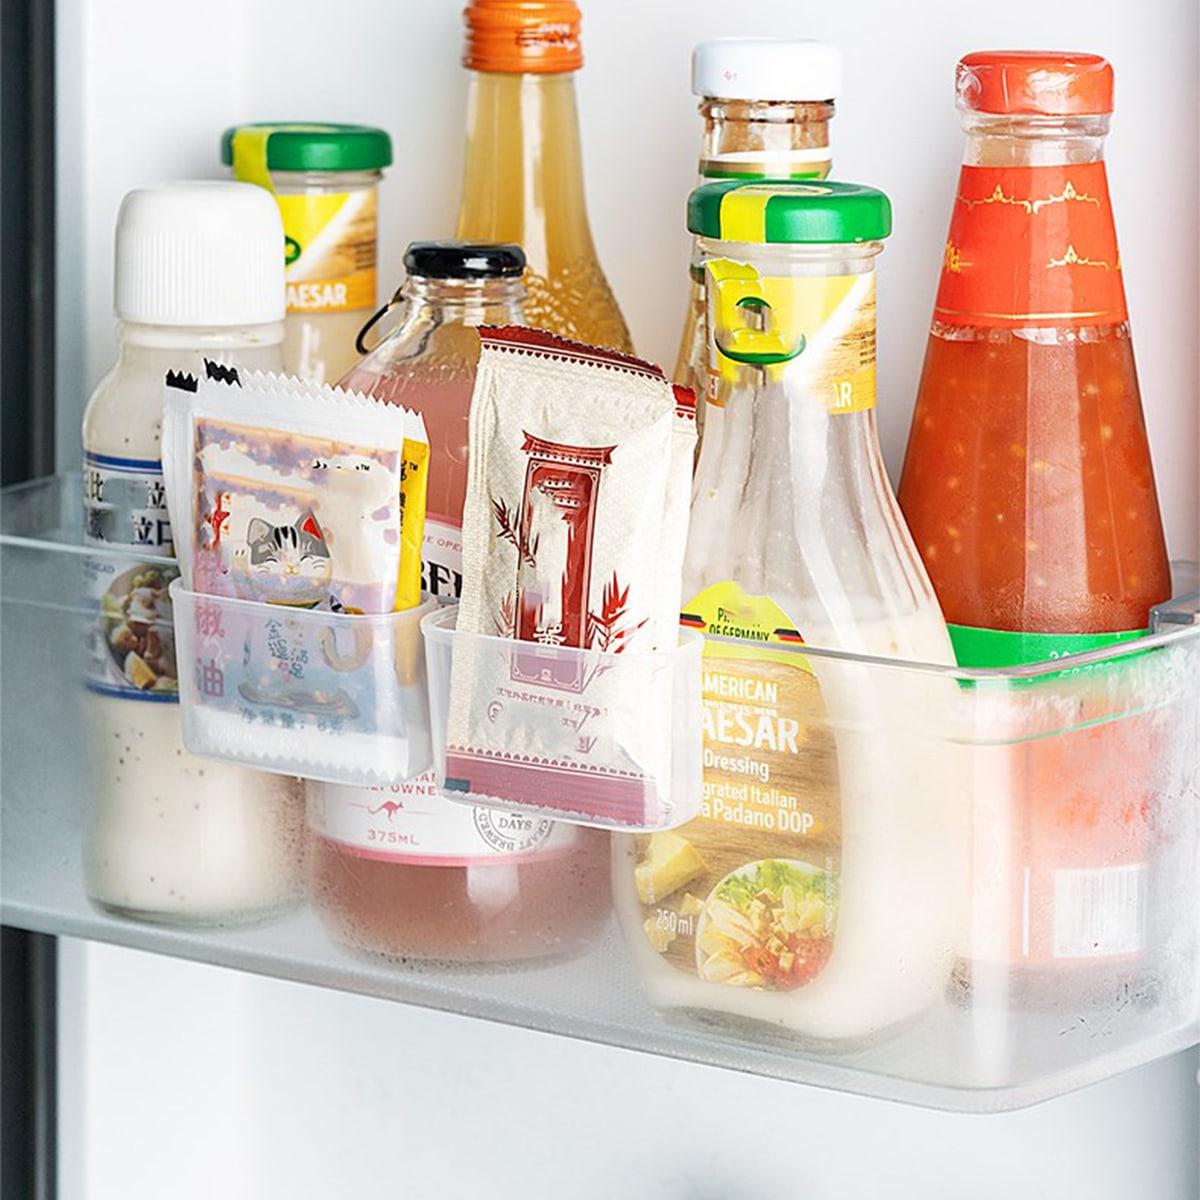 SHEIN / 2pcs Kitchen Clear Storage Box